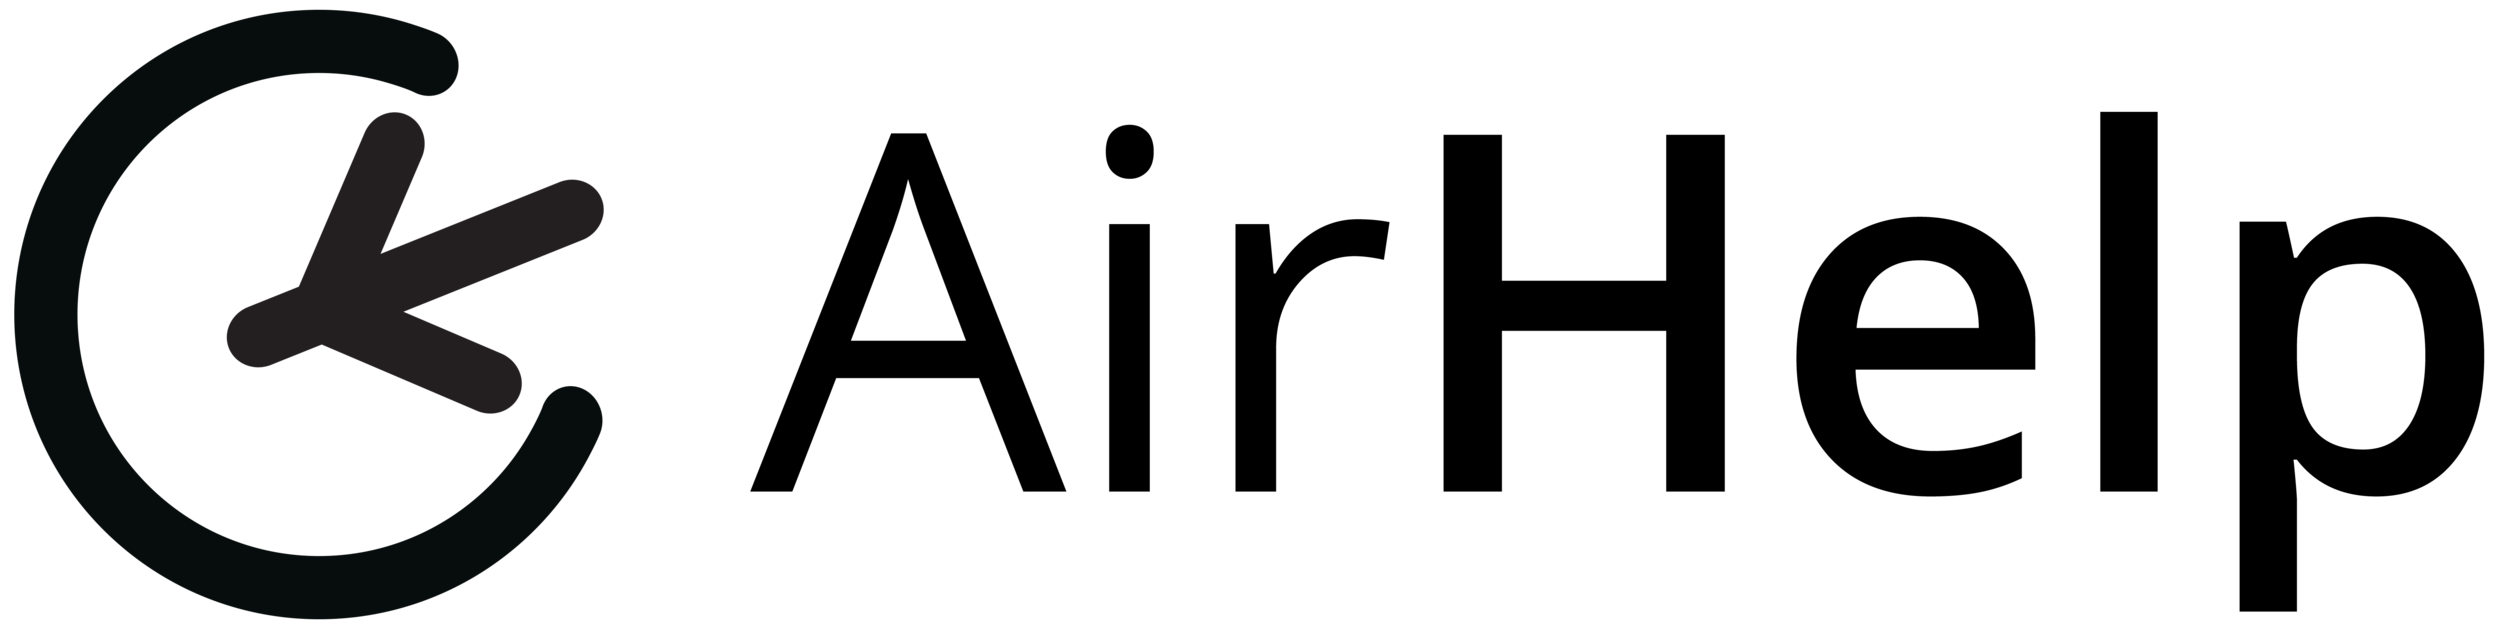 Update 7_ 26air-help-logo.png